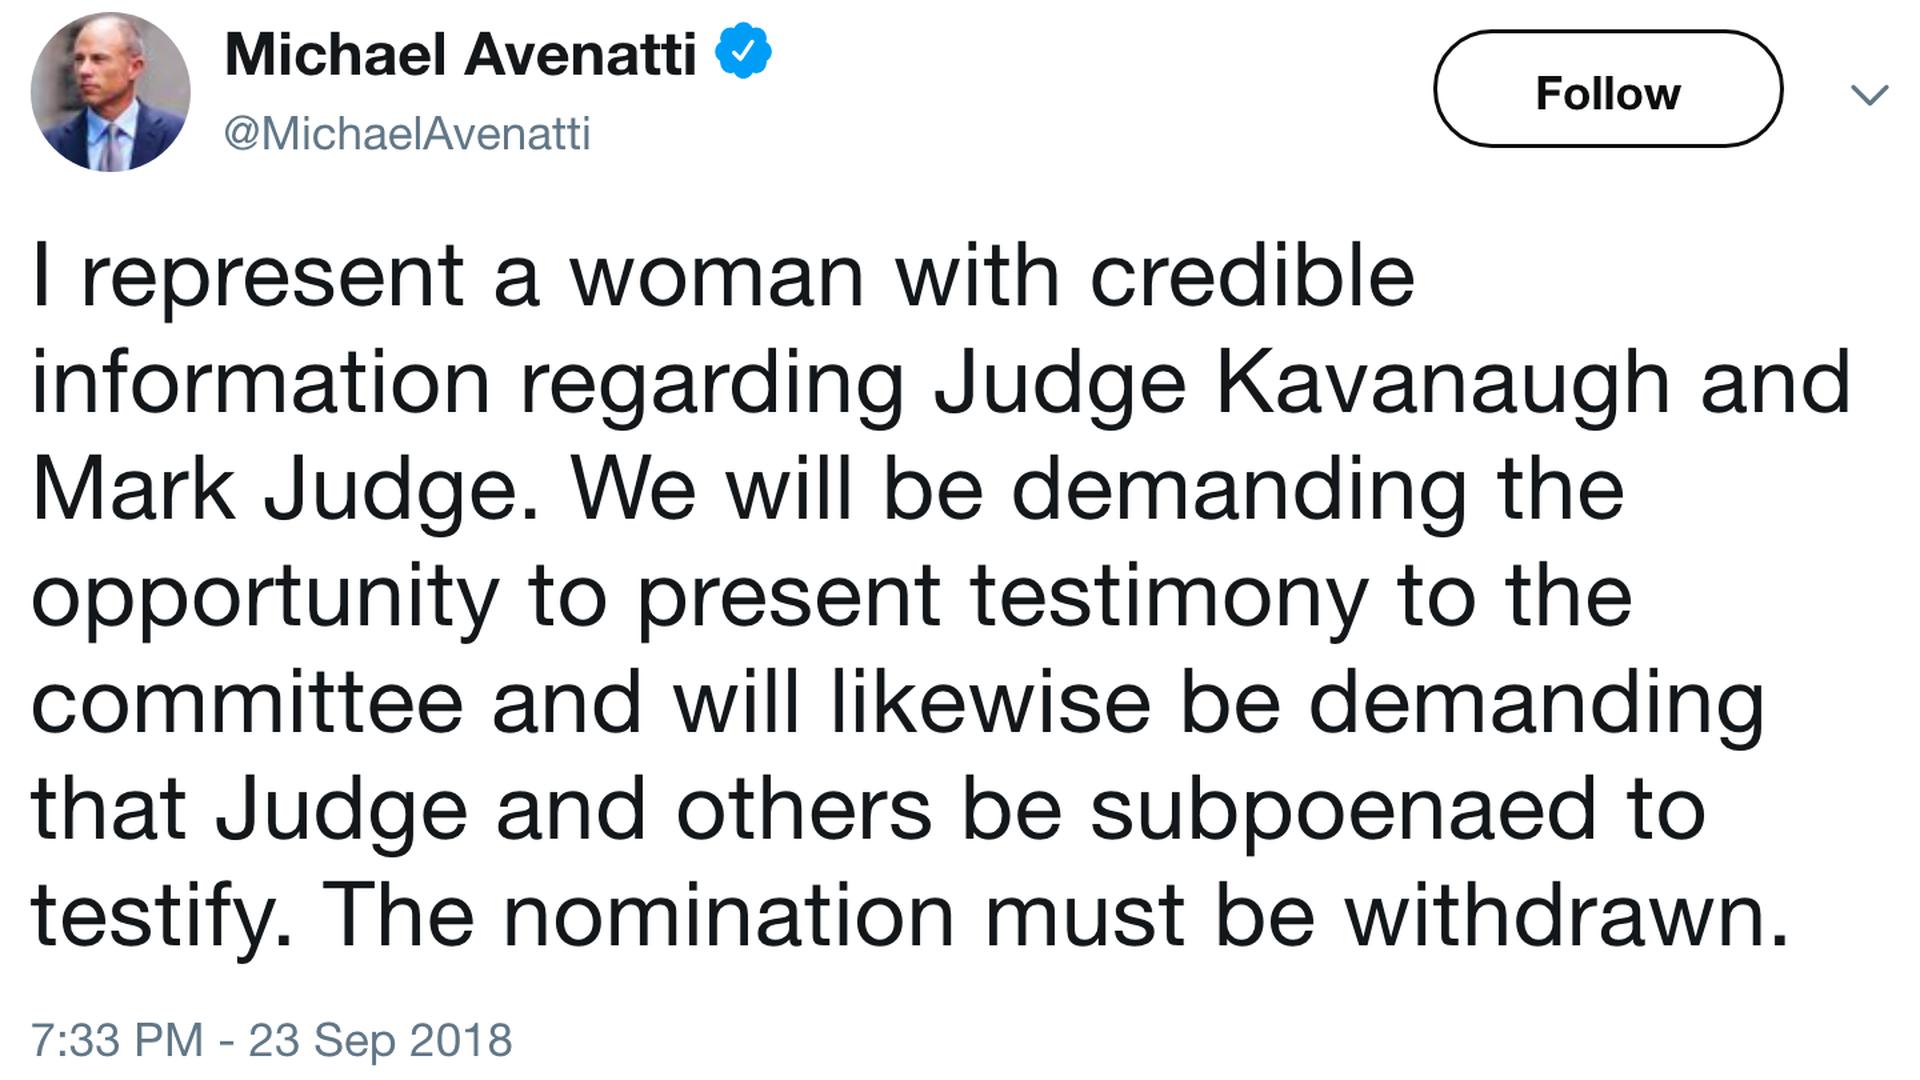 axios.com - Michael Avenatti says he represents woman with 'credible' Kavanaugh information